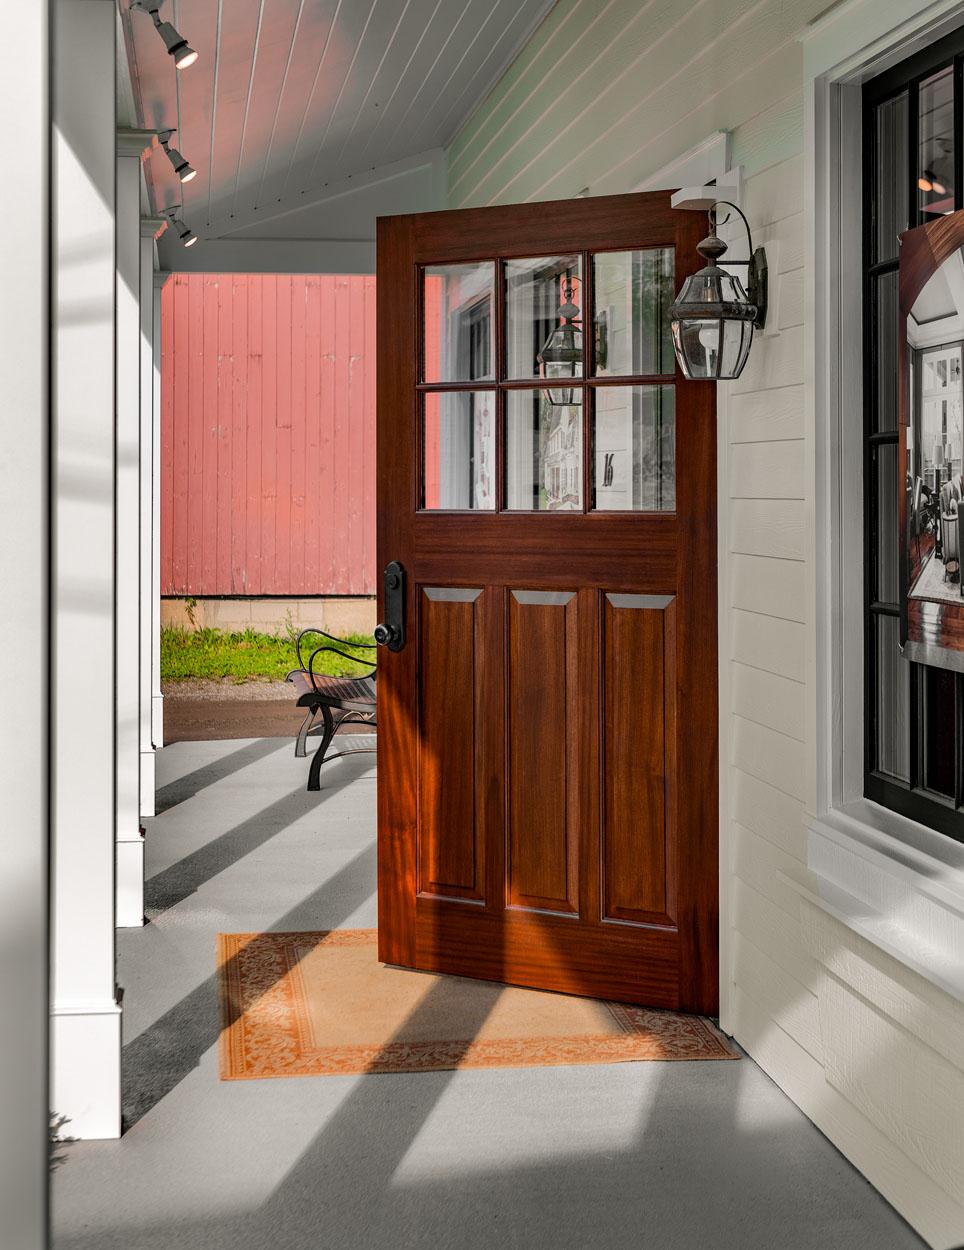 New Front Door by Rodger Manley